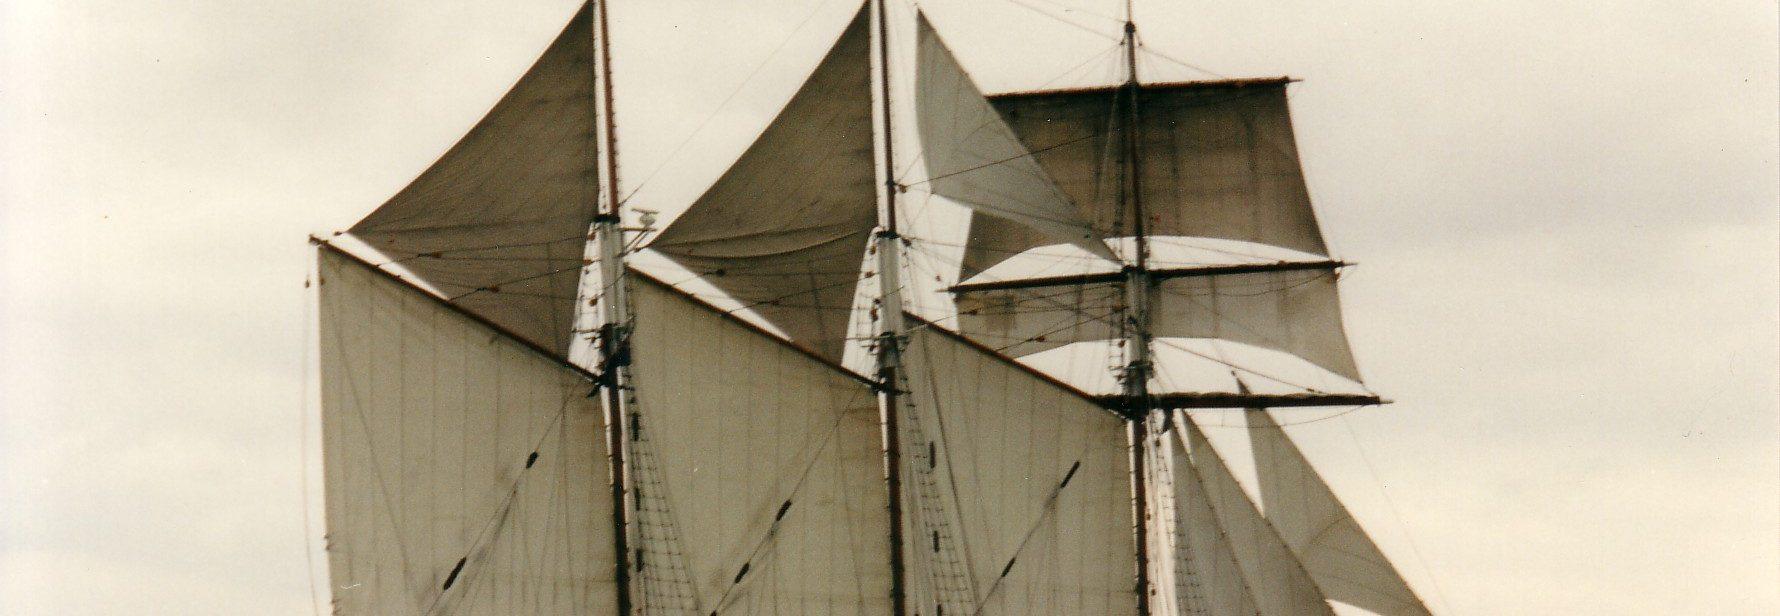 Alma Doepel under sail on Voyage